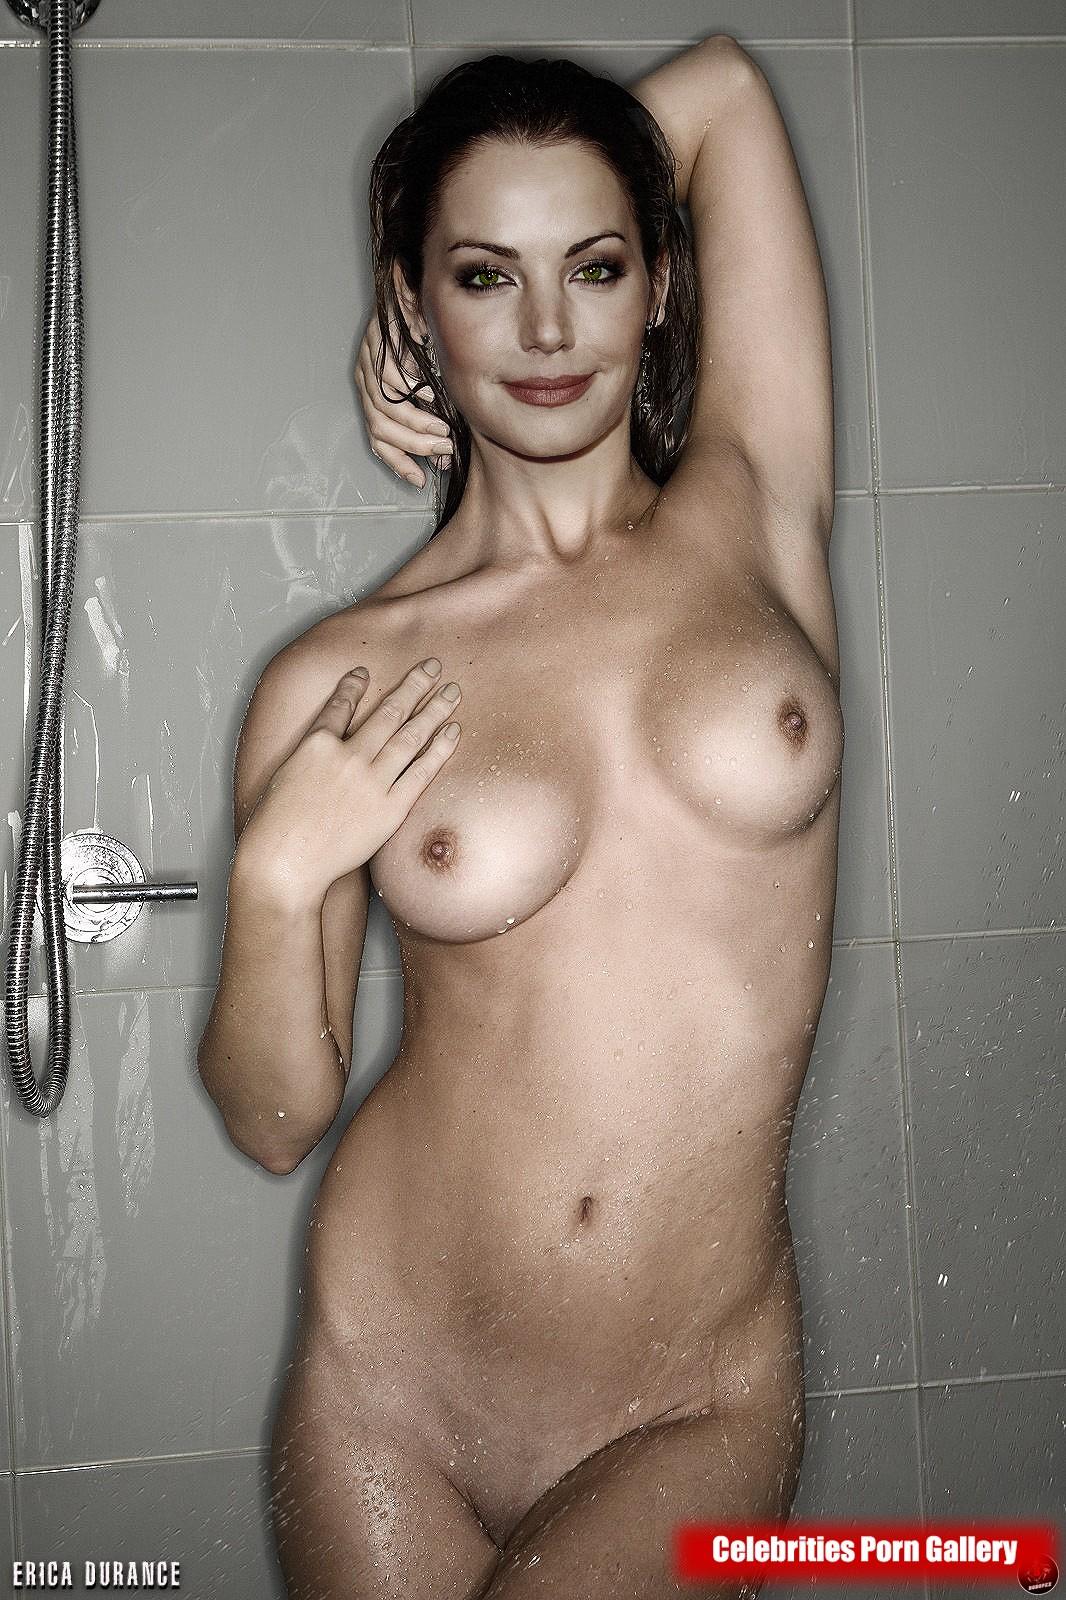 Erica Durance Tits